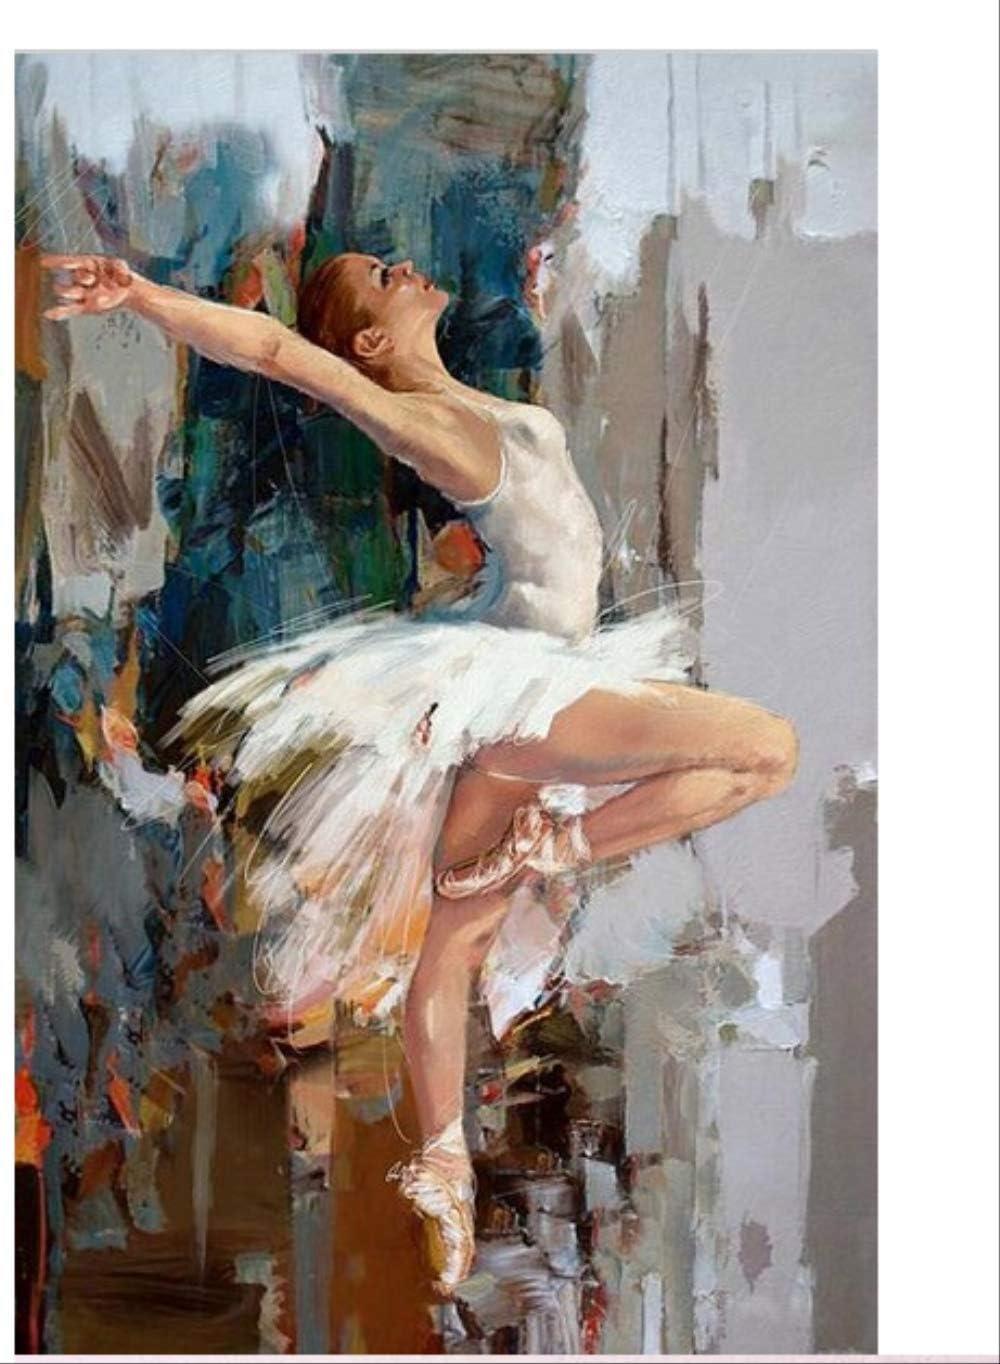 RUIYAN Cuadro En Lienzo Bailarina Bailarina Pintura Al Óleo Famoso Pintor Mahanur Pintura Abstracta Ballet Chica Mural Mm34A 40X60Cm Sin Marco